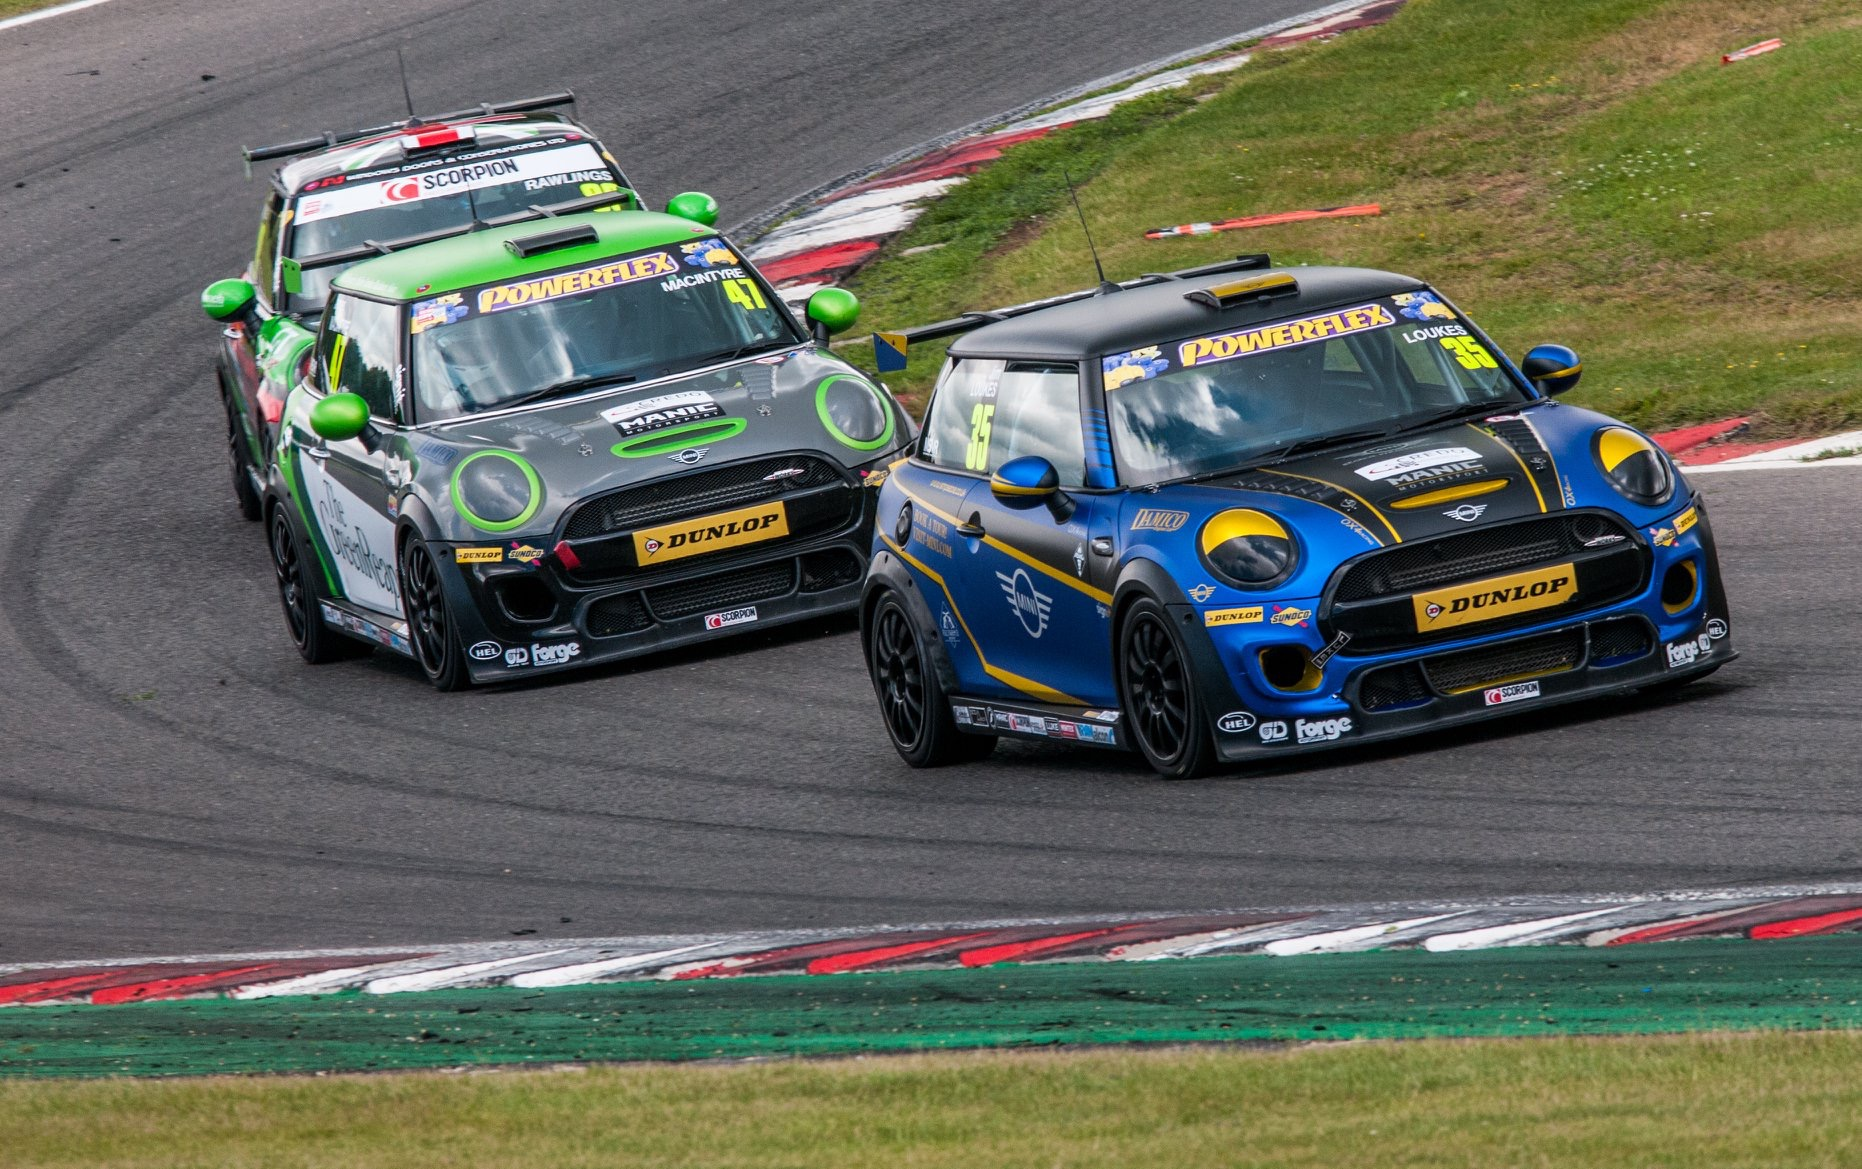 Mini's racing on track